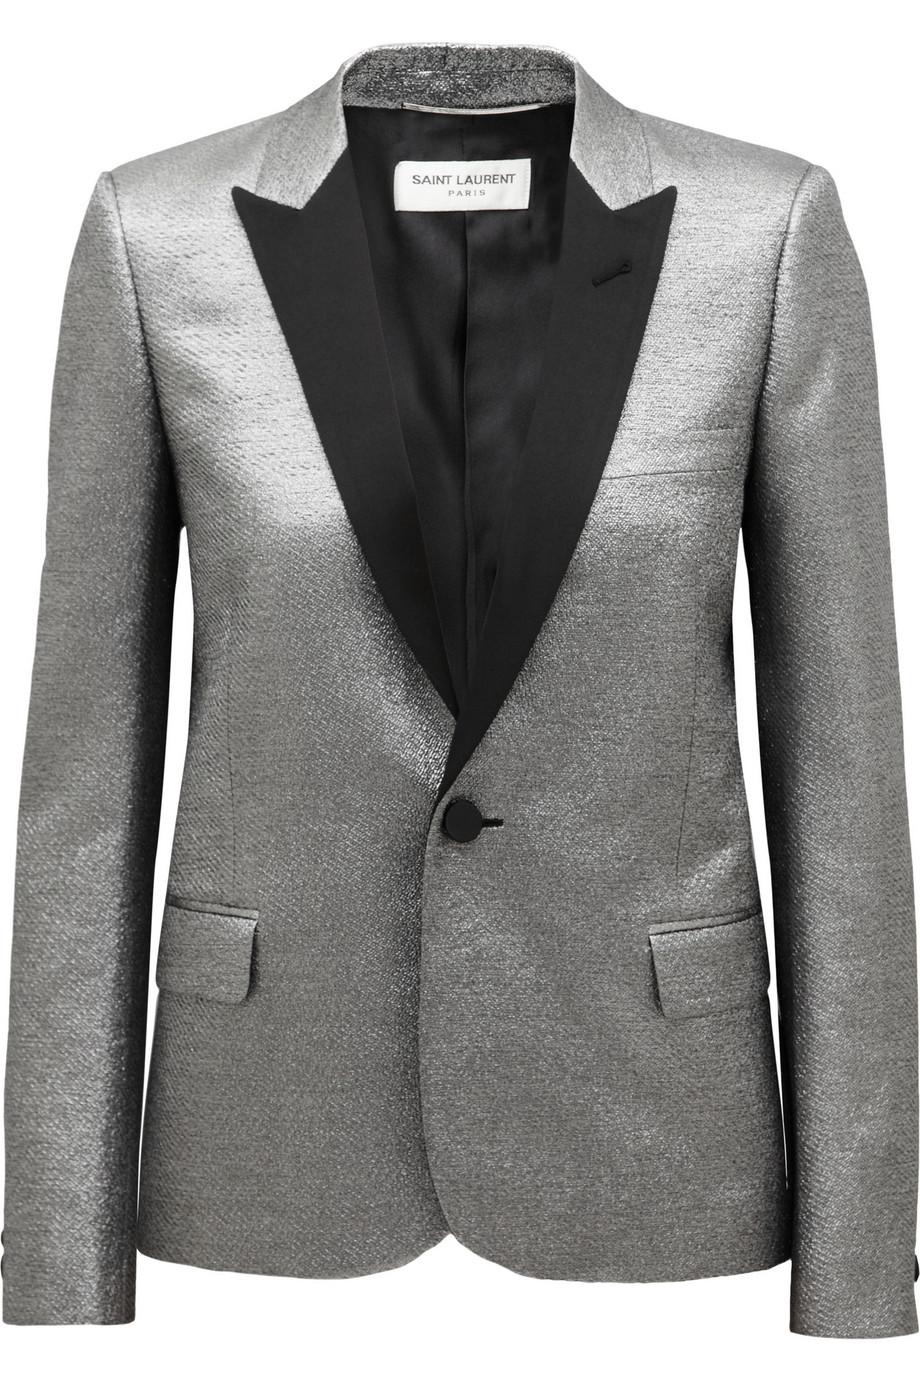 Lyst Saint Laurent Metallic Jacquard Tuxedo Jacket In